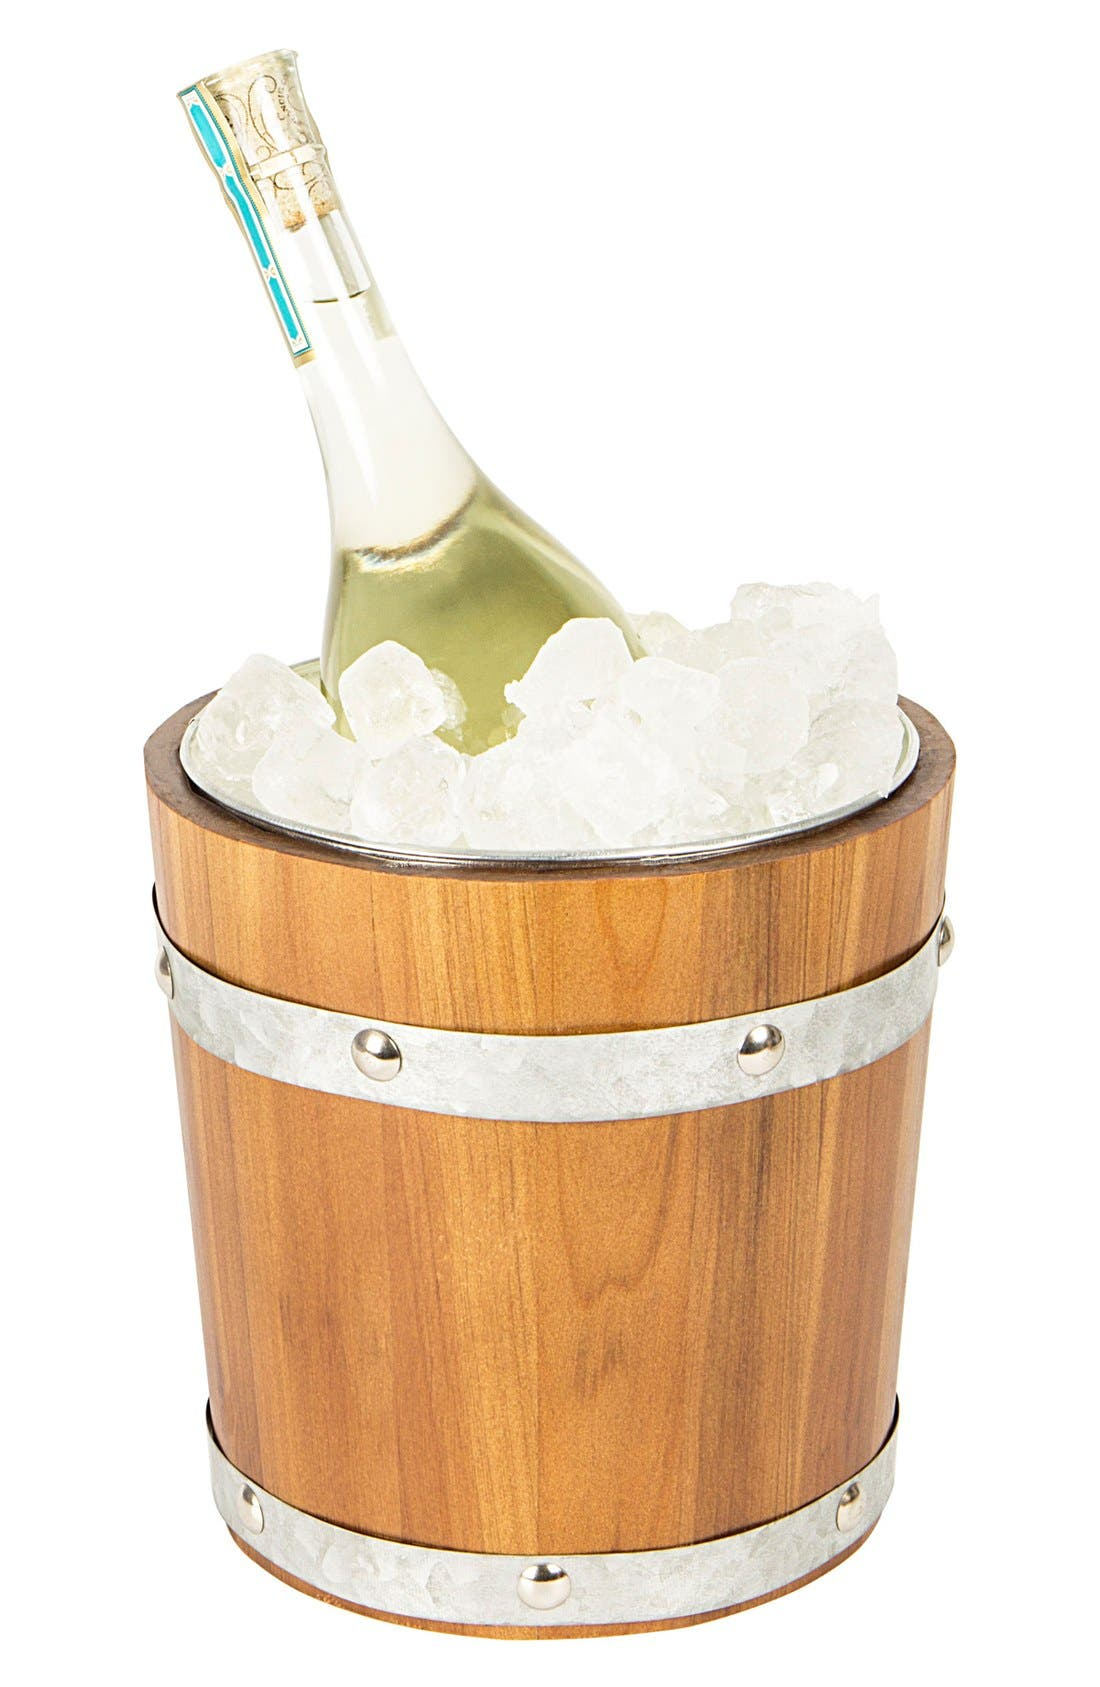 Rustic Monogram Ice Bucket,                             Main thumbnail 1, color,                             200